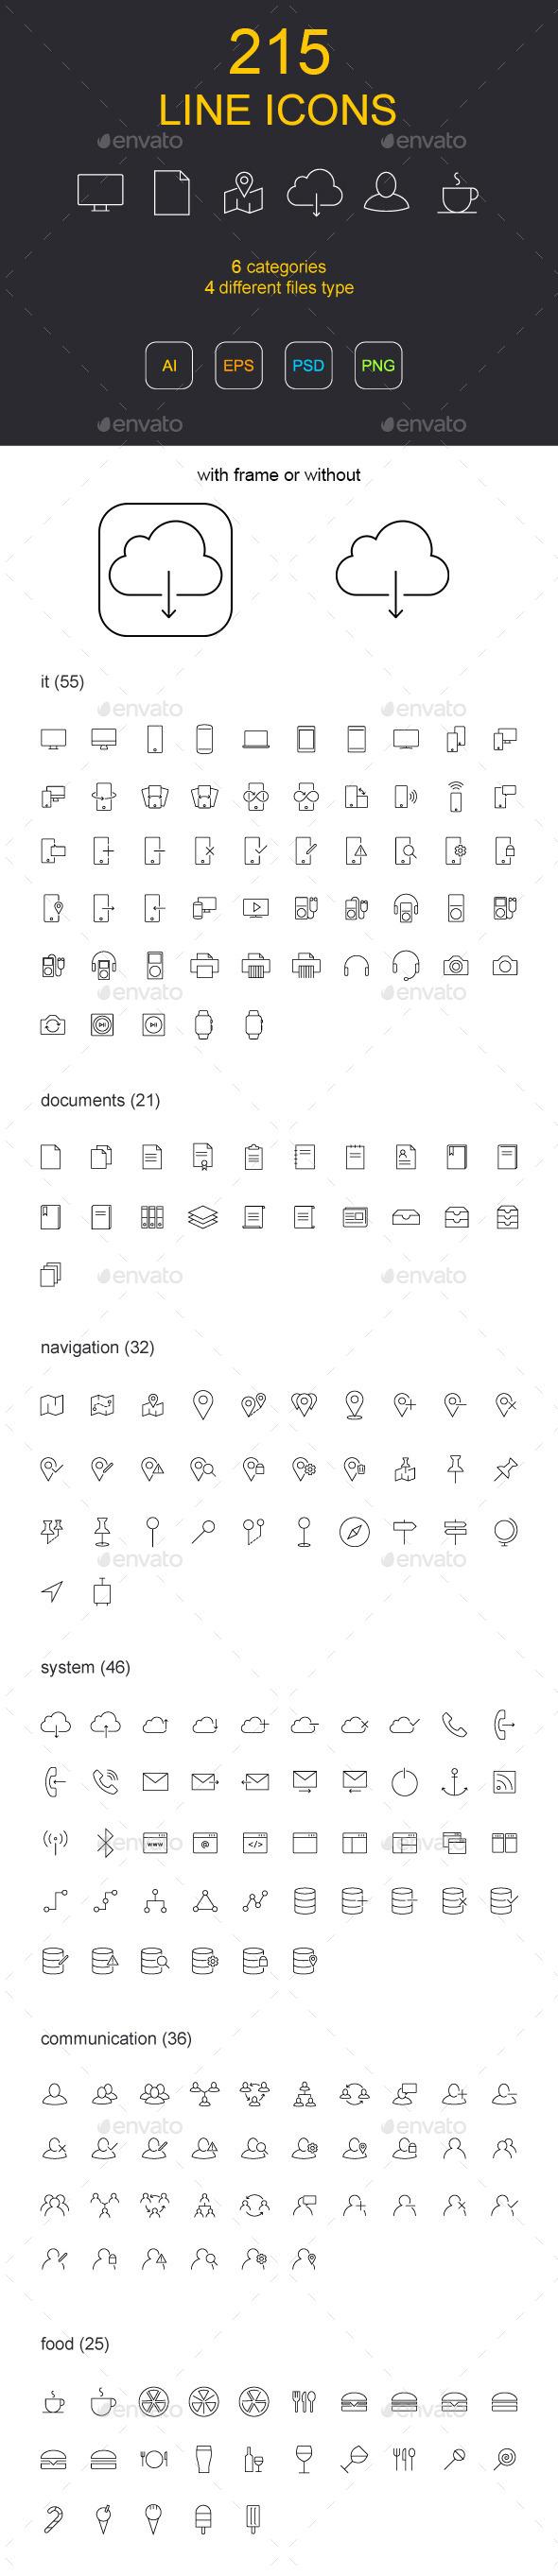 GraphicRiver 215 Line Icons 9865041